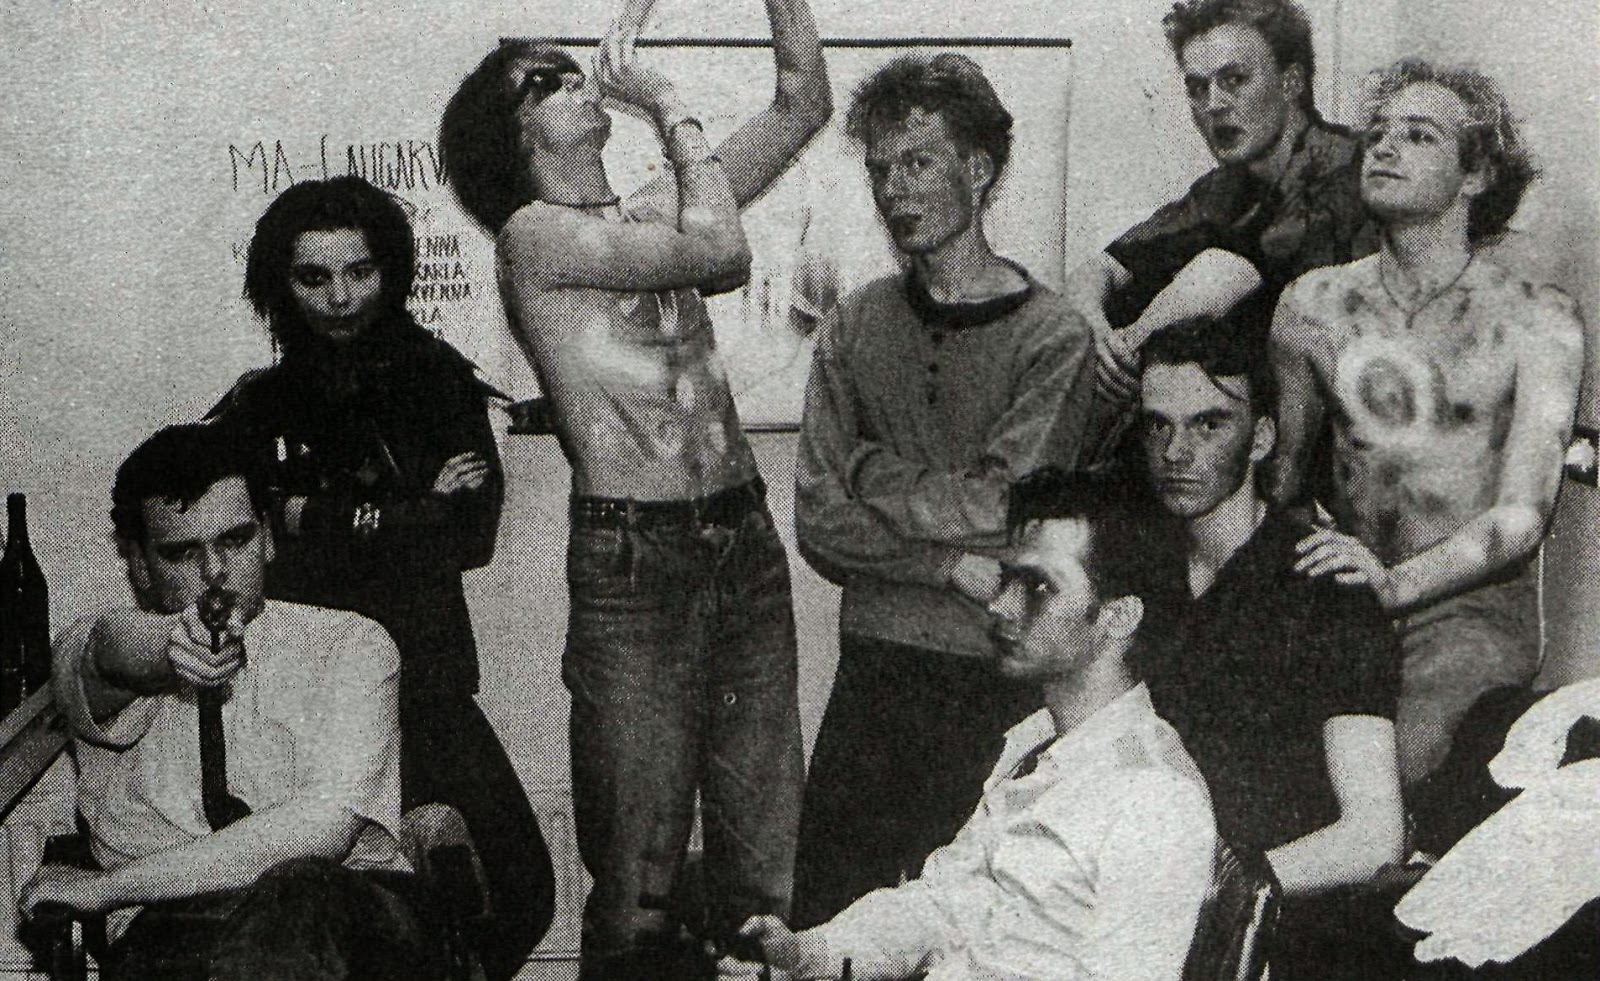 bj_rk-k-u-k-l-early-punk-band-edited-icelandic-news-paper-scan-high-resolution-1980s